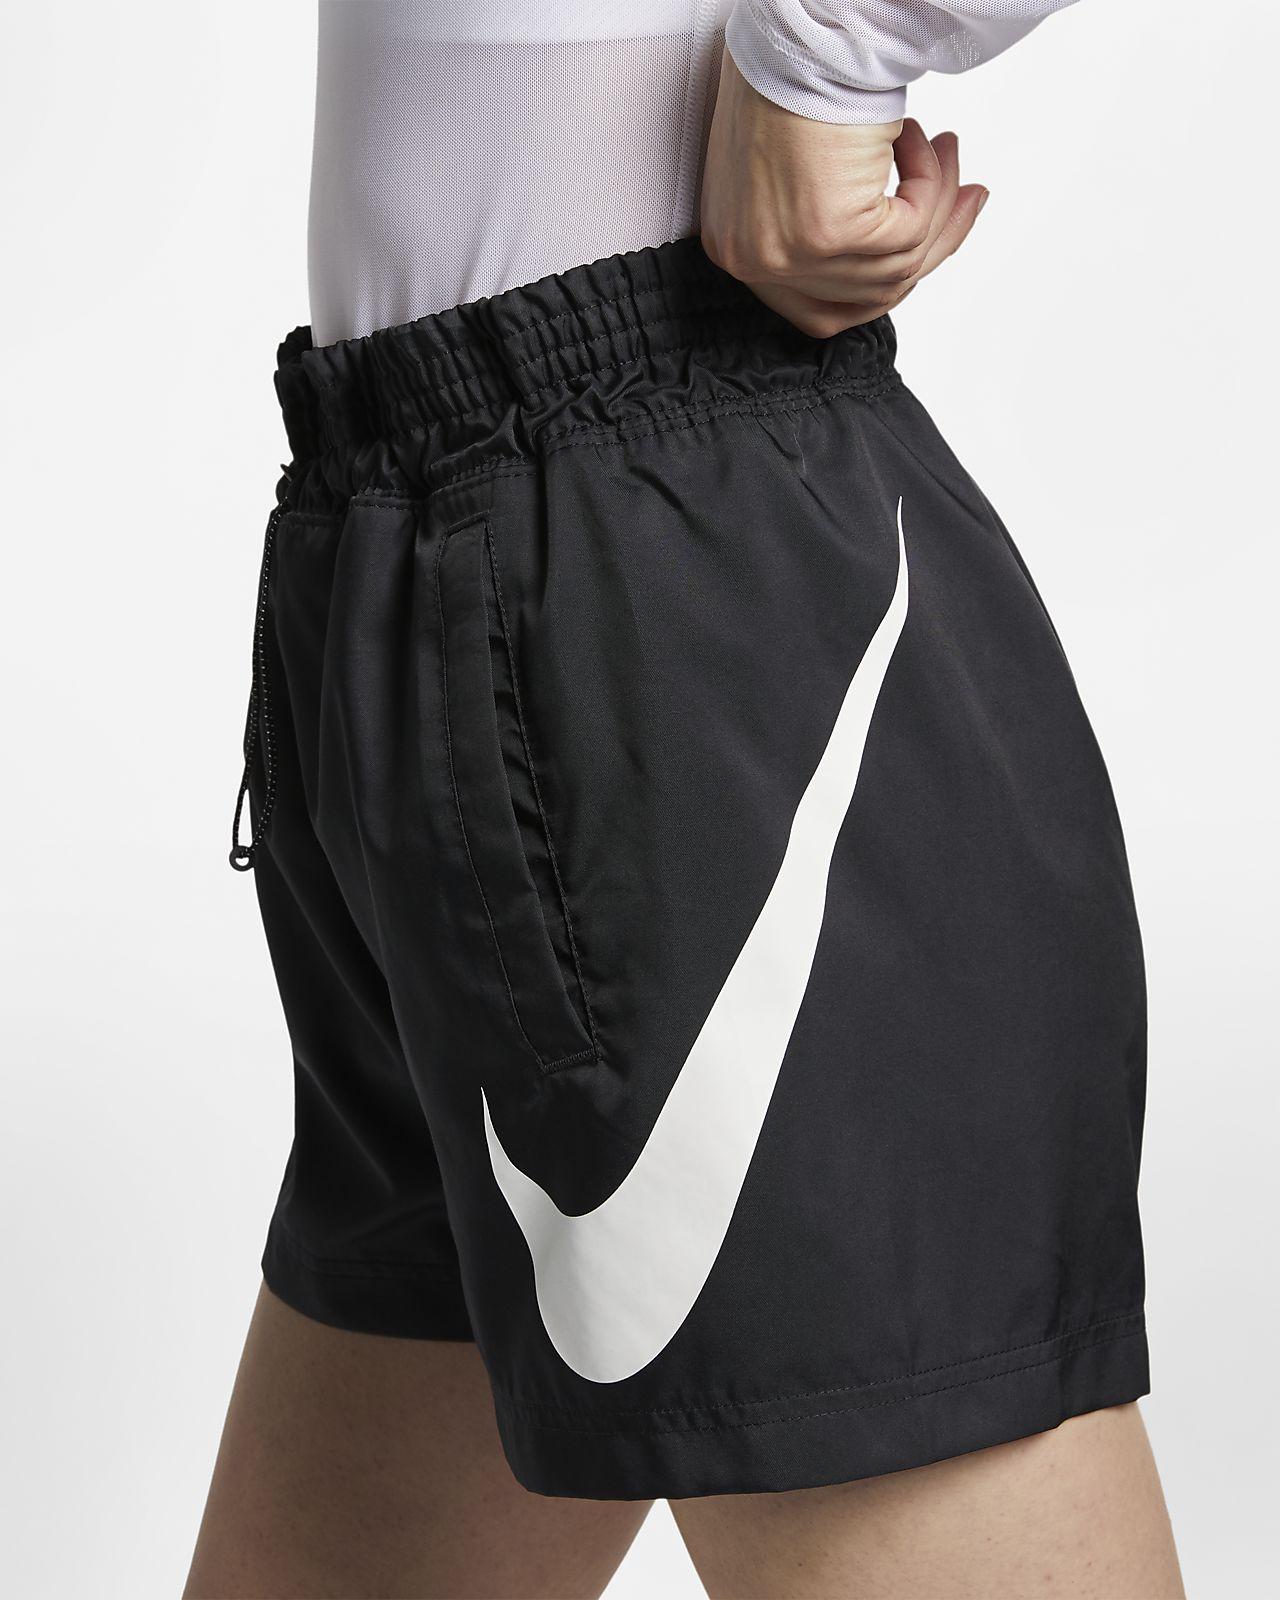 Shorts in woven Nike Sportswear Swoosh - Donna